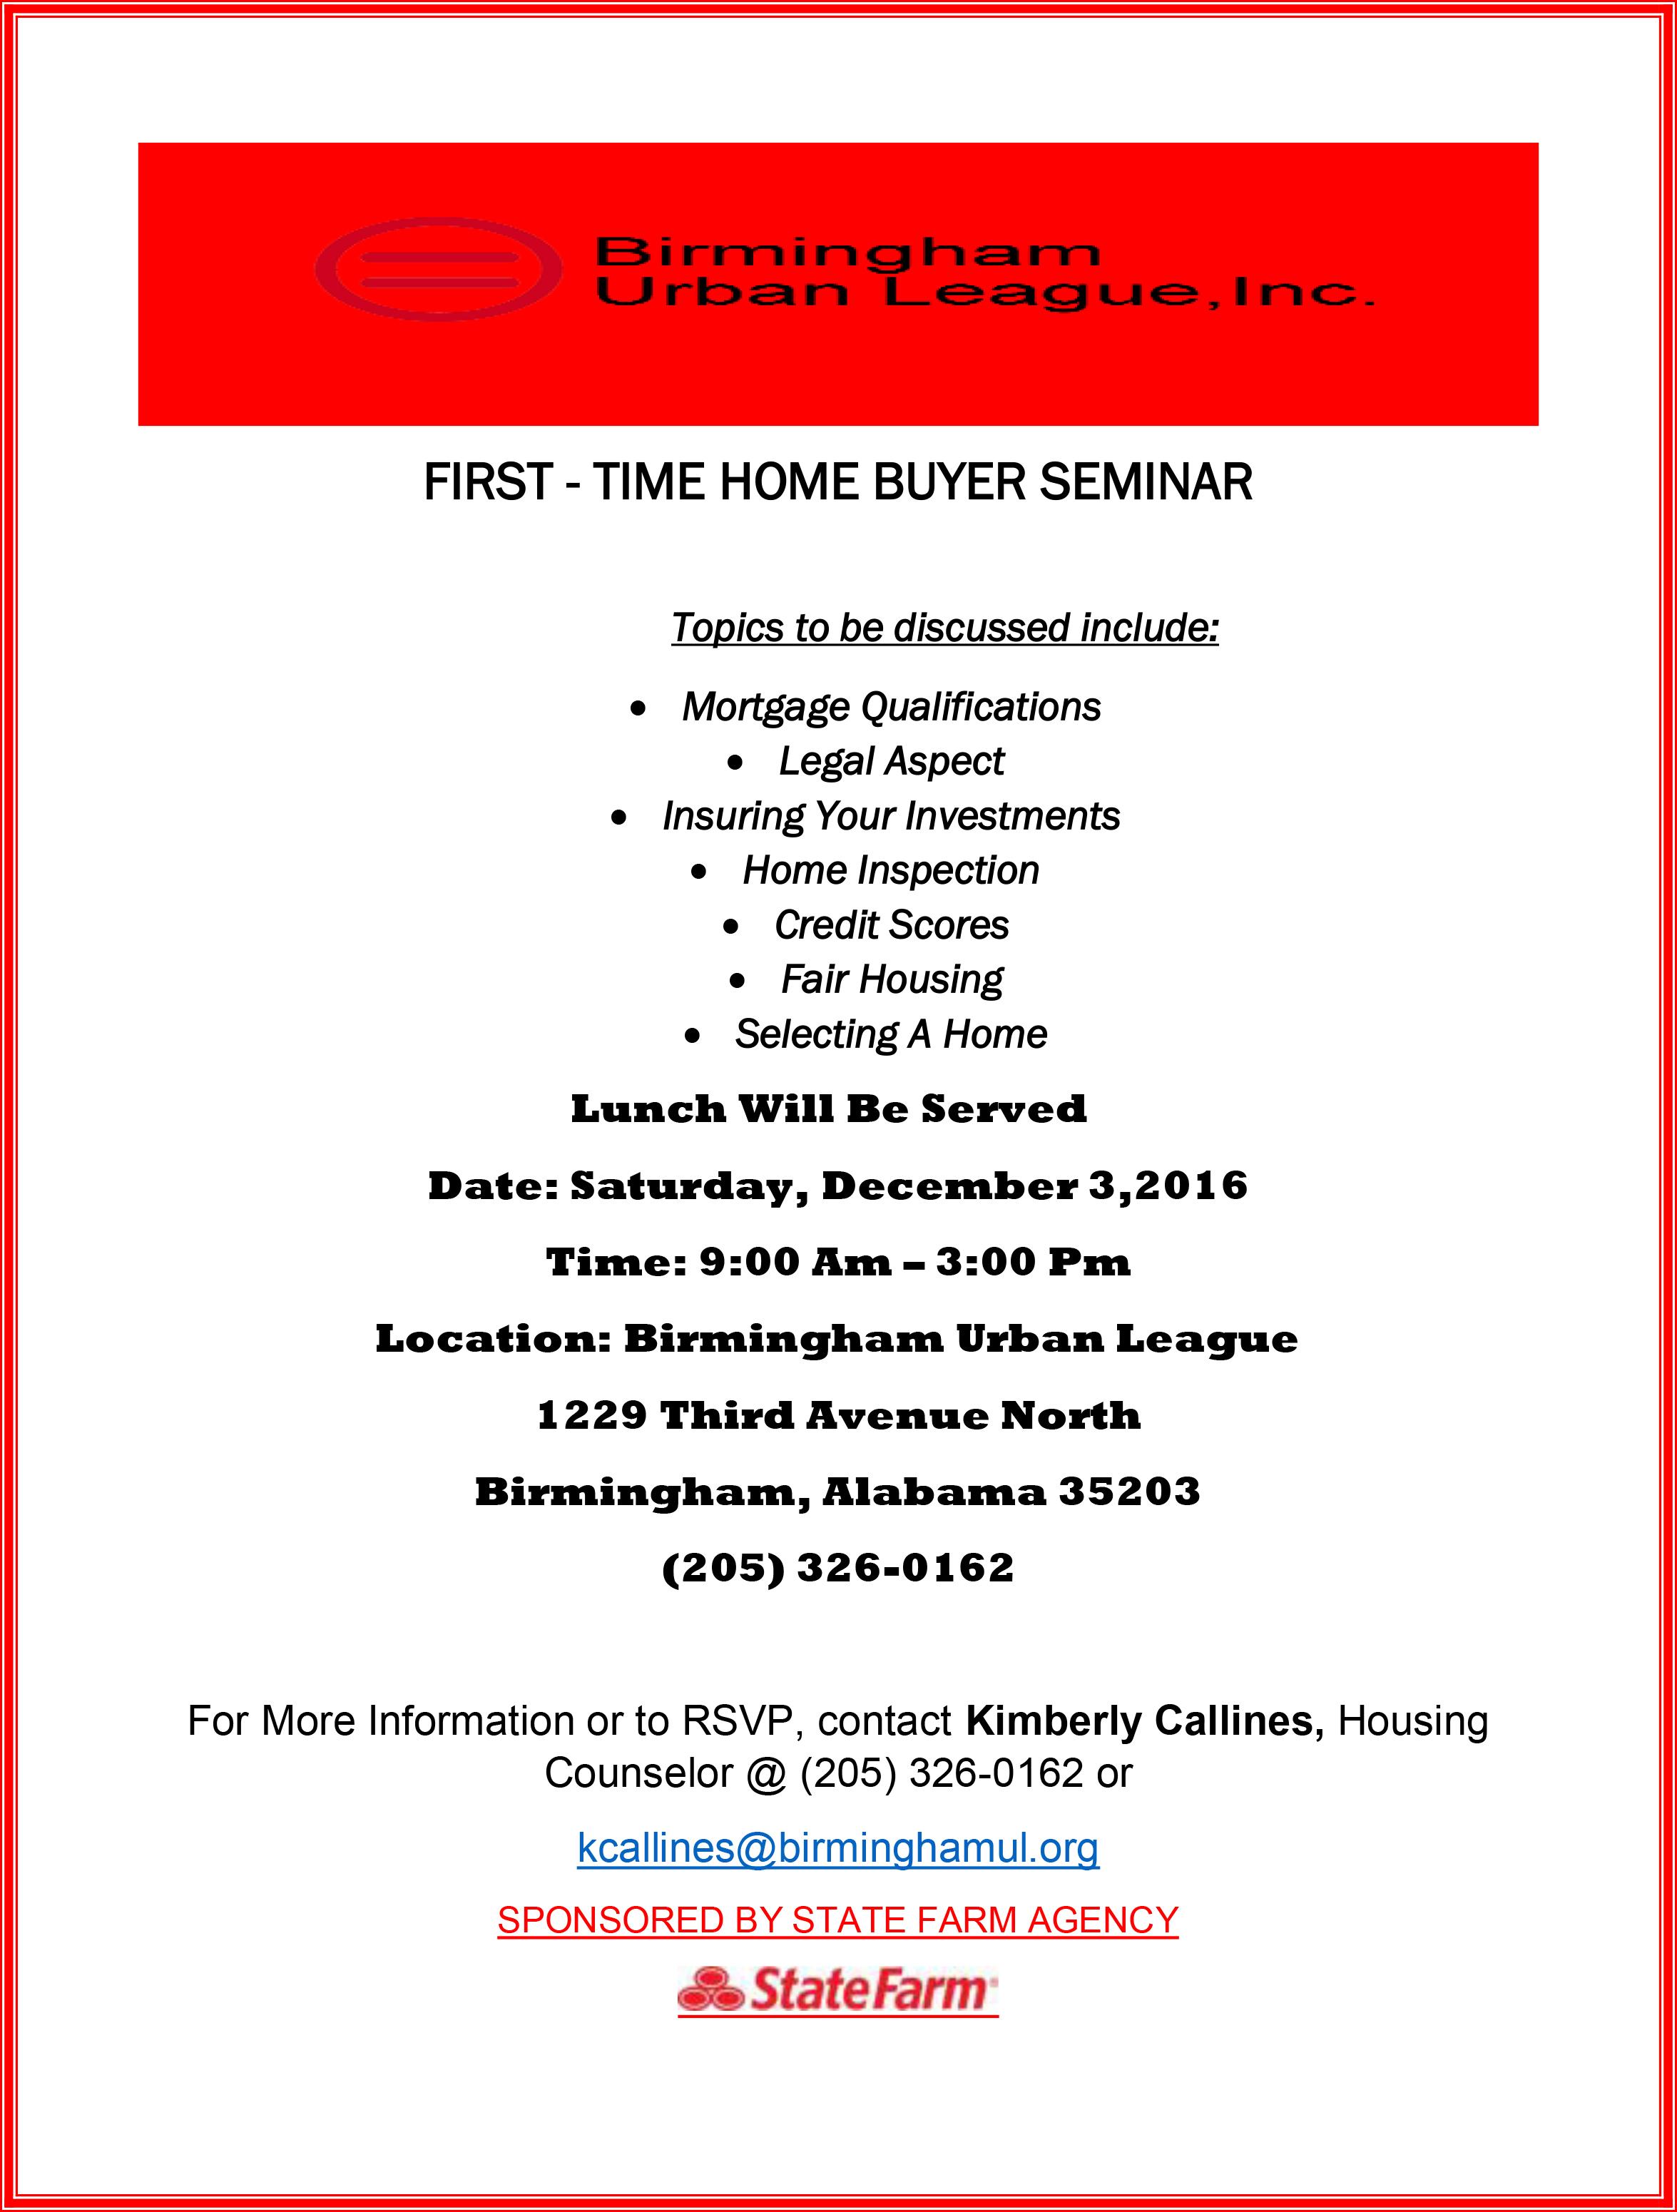 home-buyer-seminar-december-32016